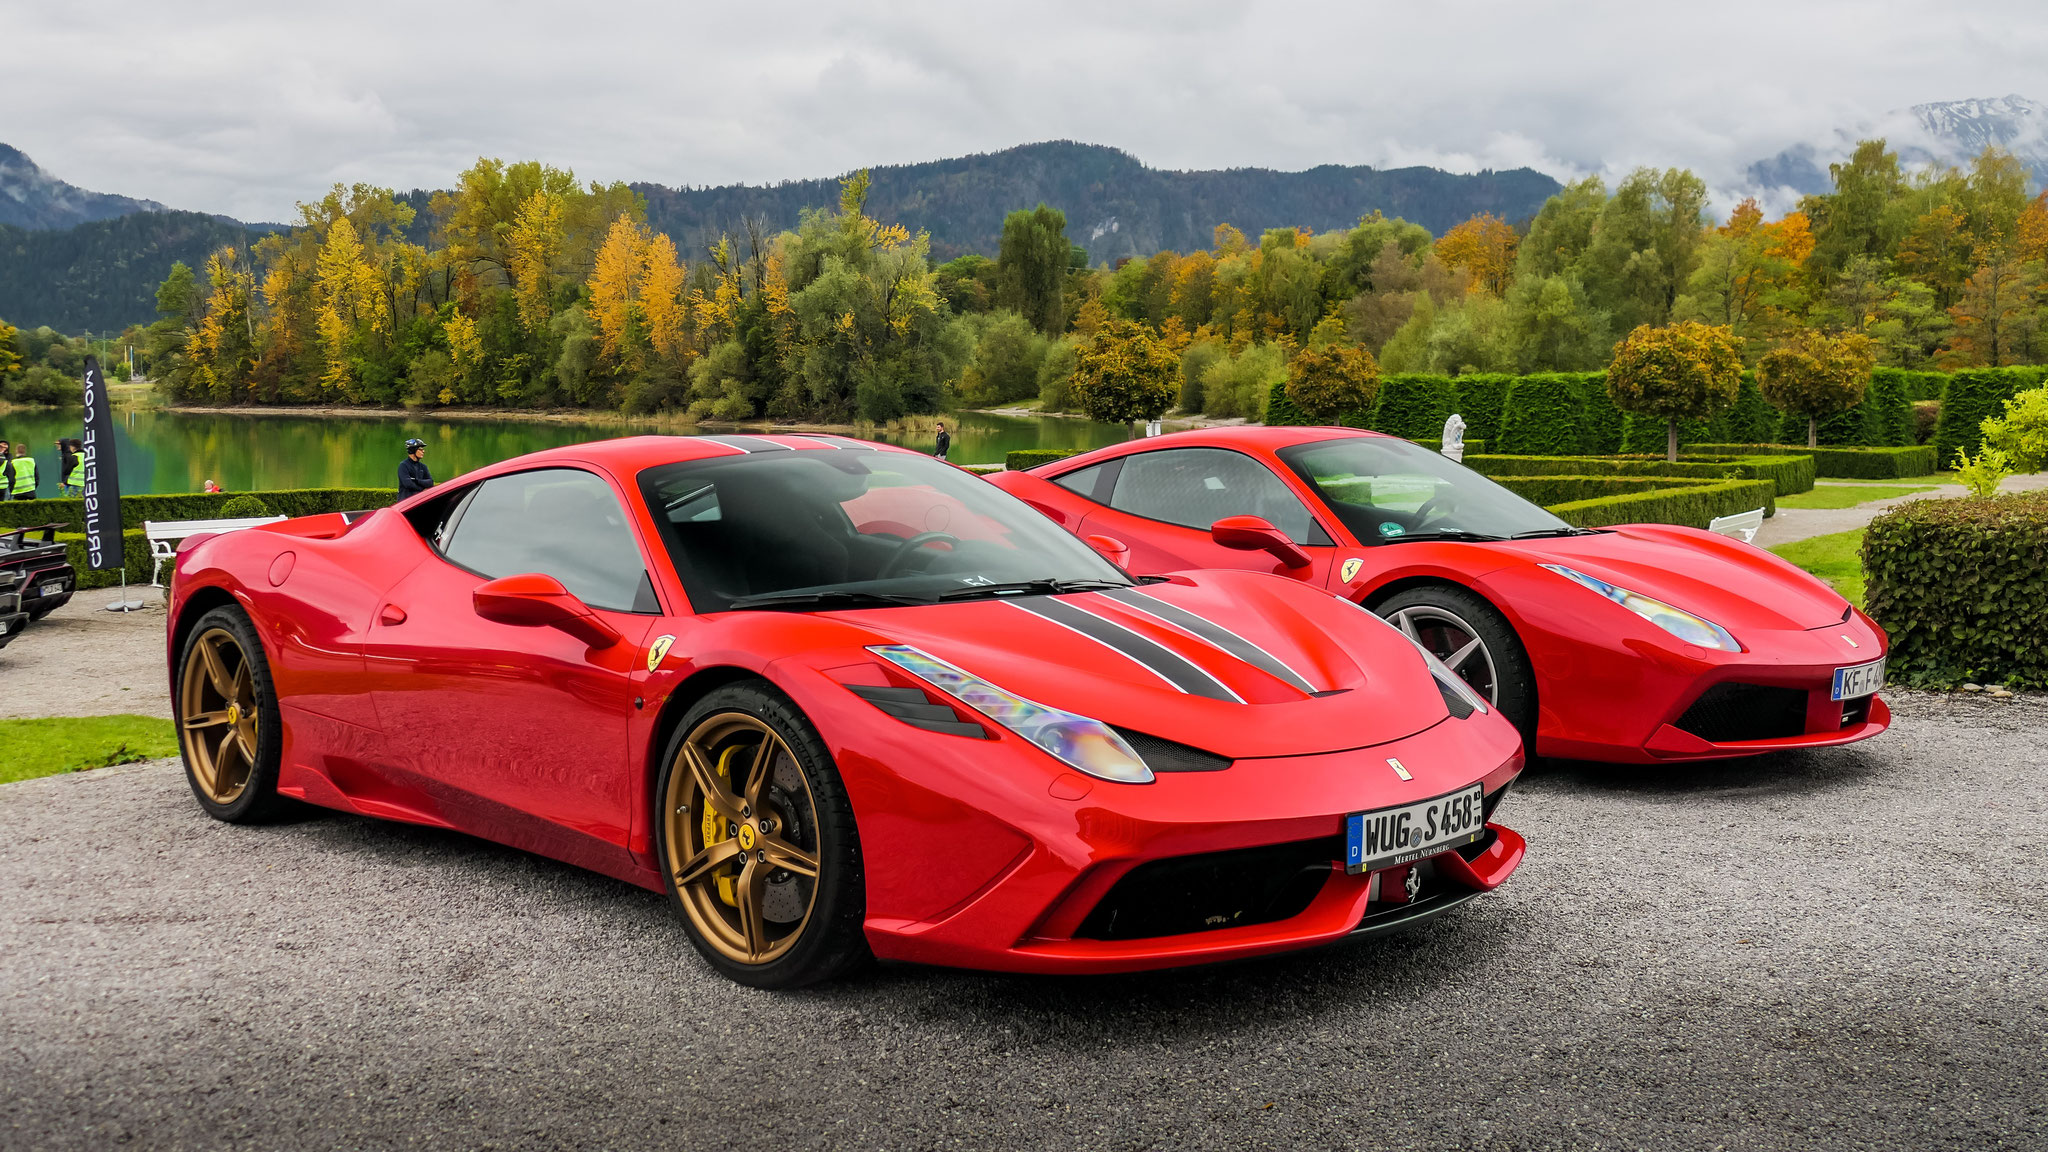 Ferrari 458 Speciale - WUG-S-458